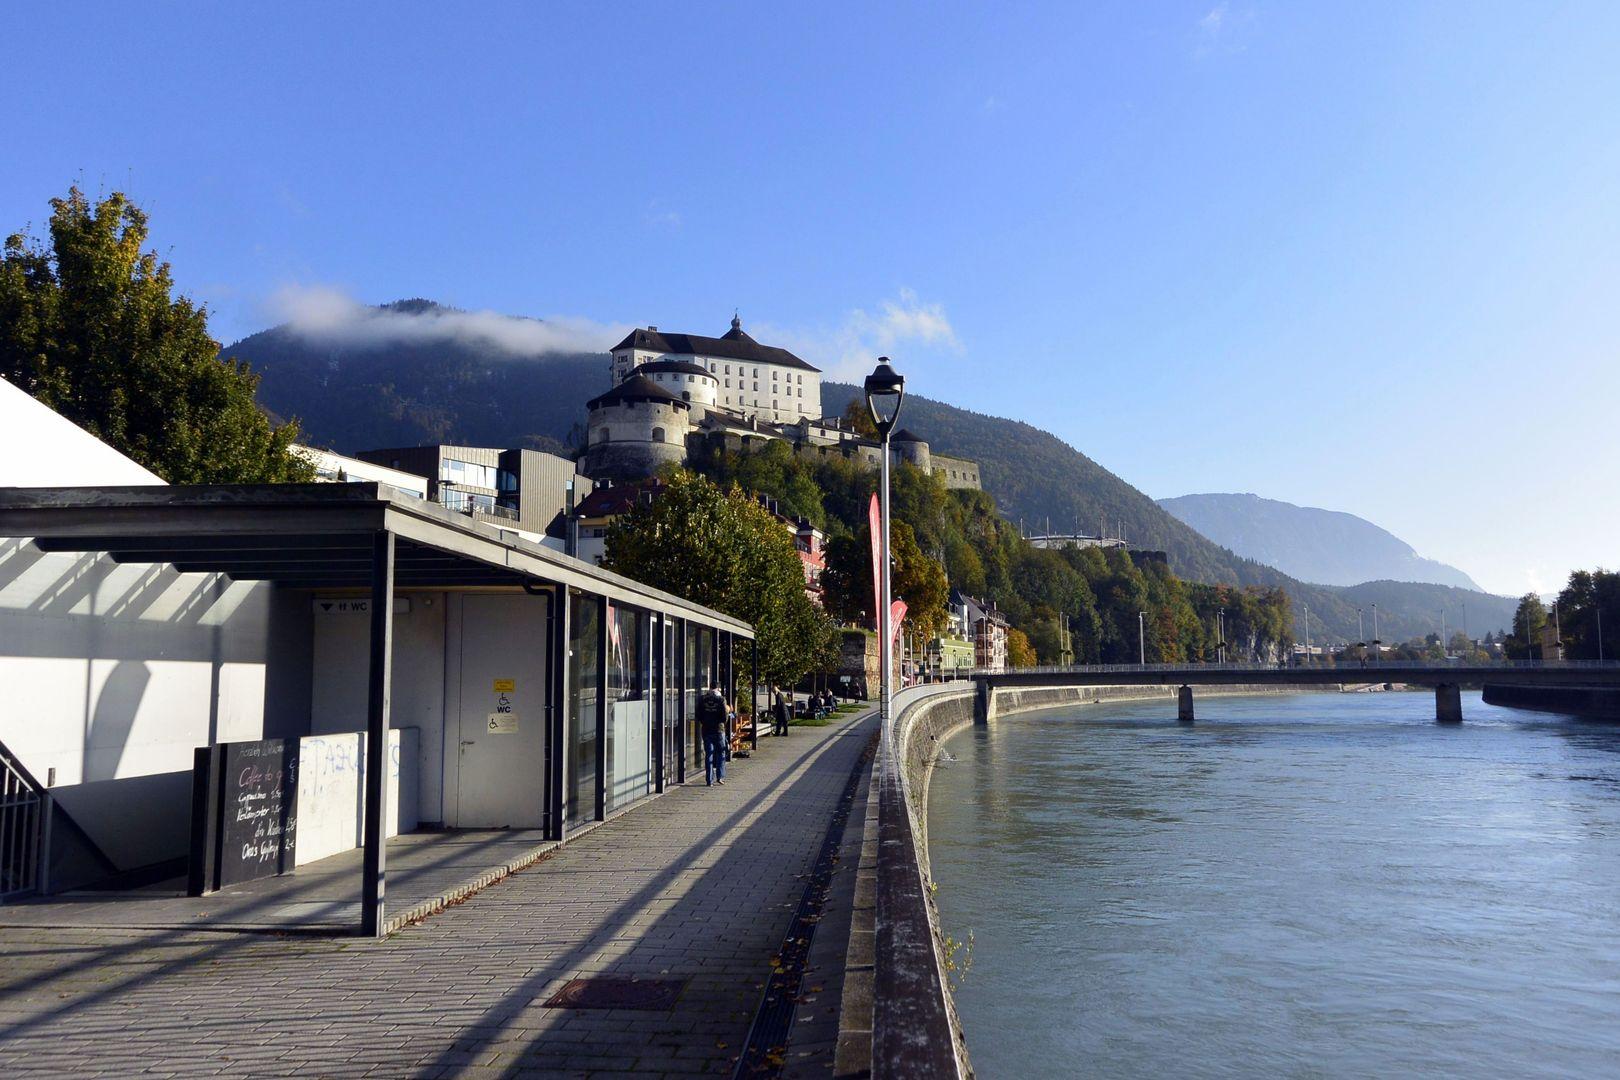 Nikon 1 V2 - 10mm Festung Kufstein